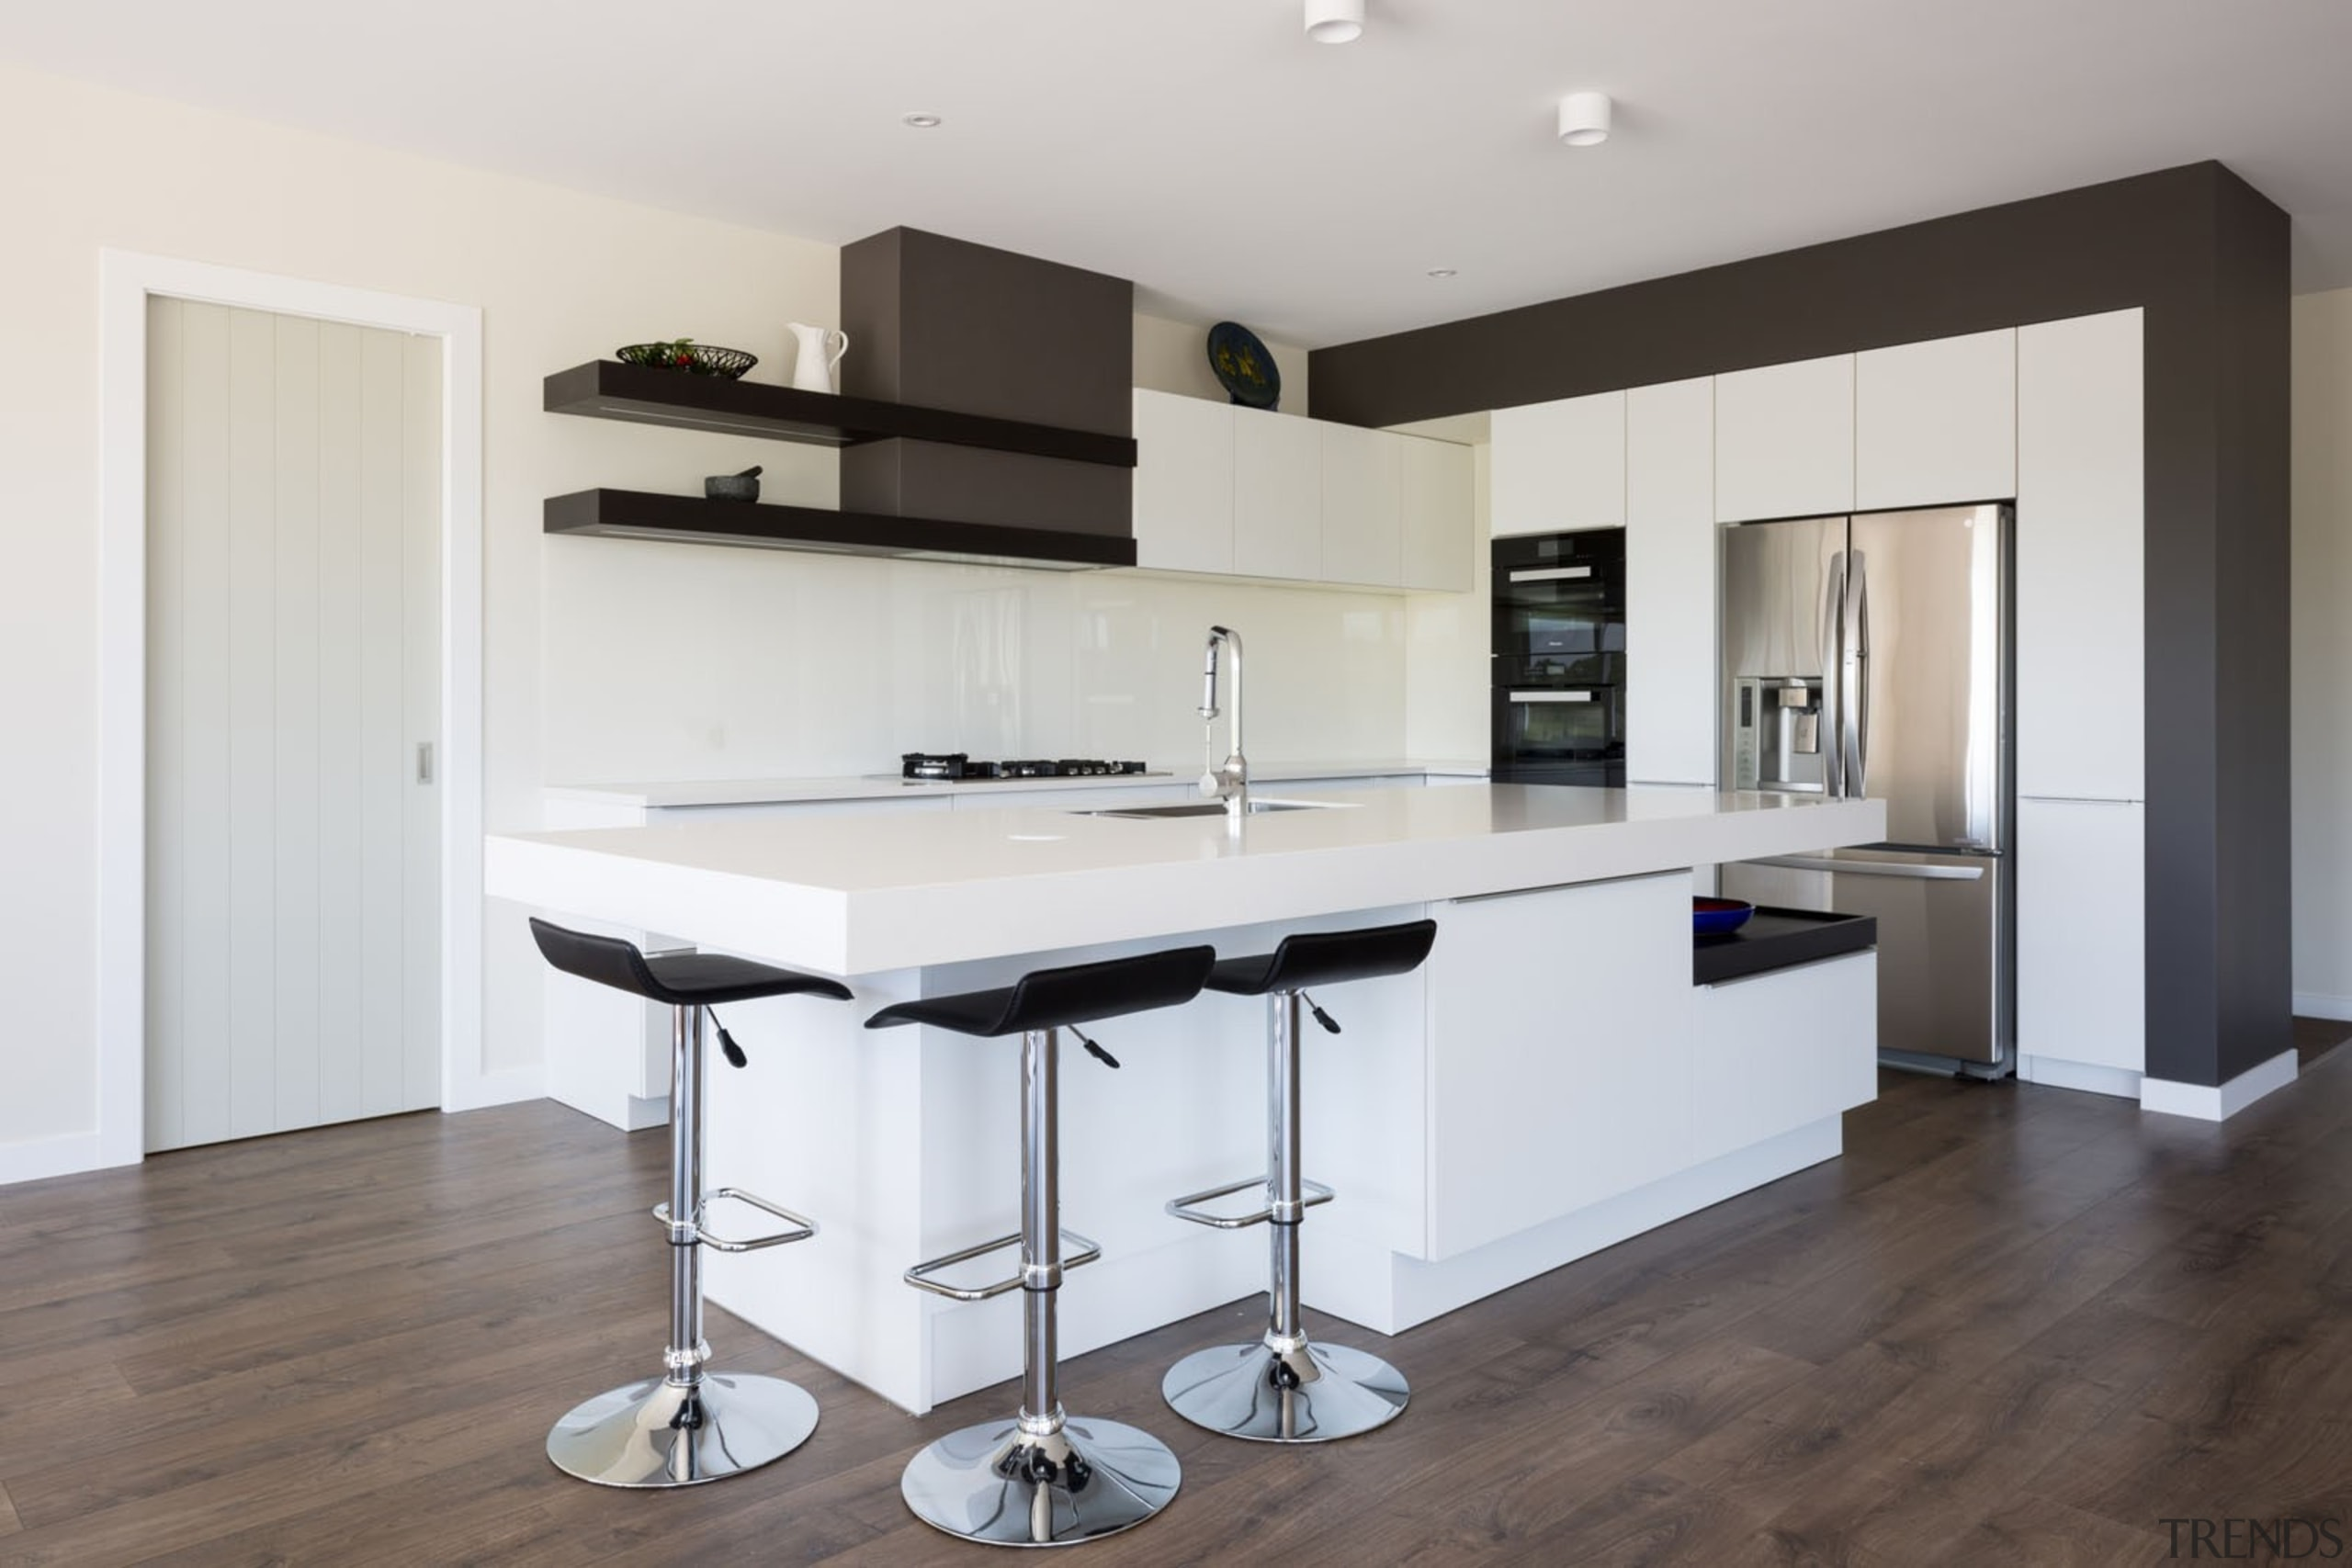 IMGL9847-2 - Dairy Flat kitchen - countertop   countertop, floor, furniture, interior design, kitchen, product design, white